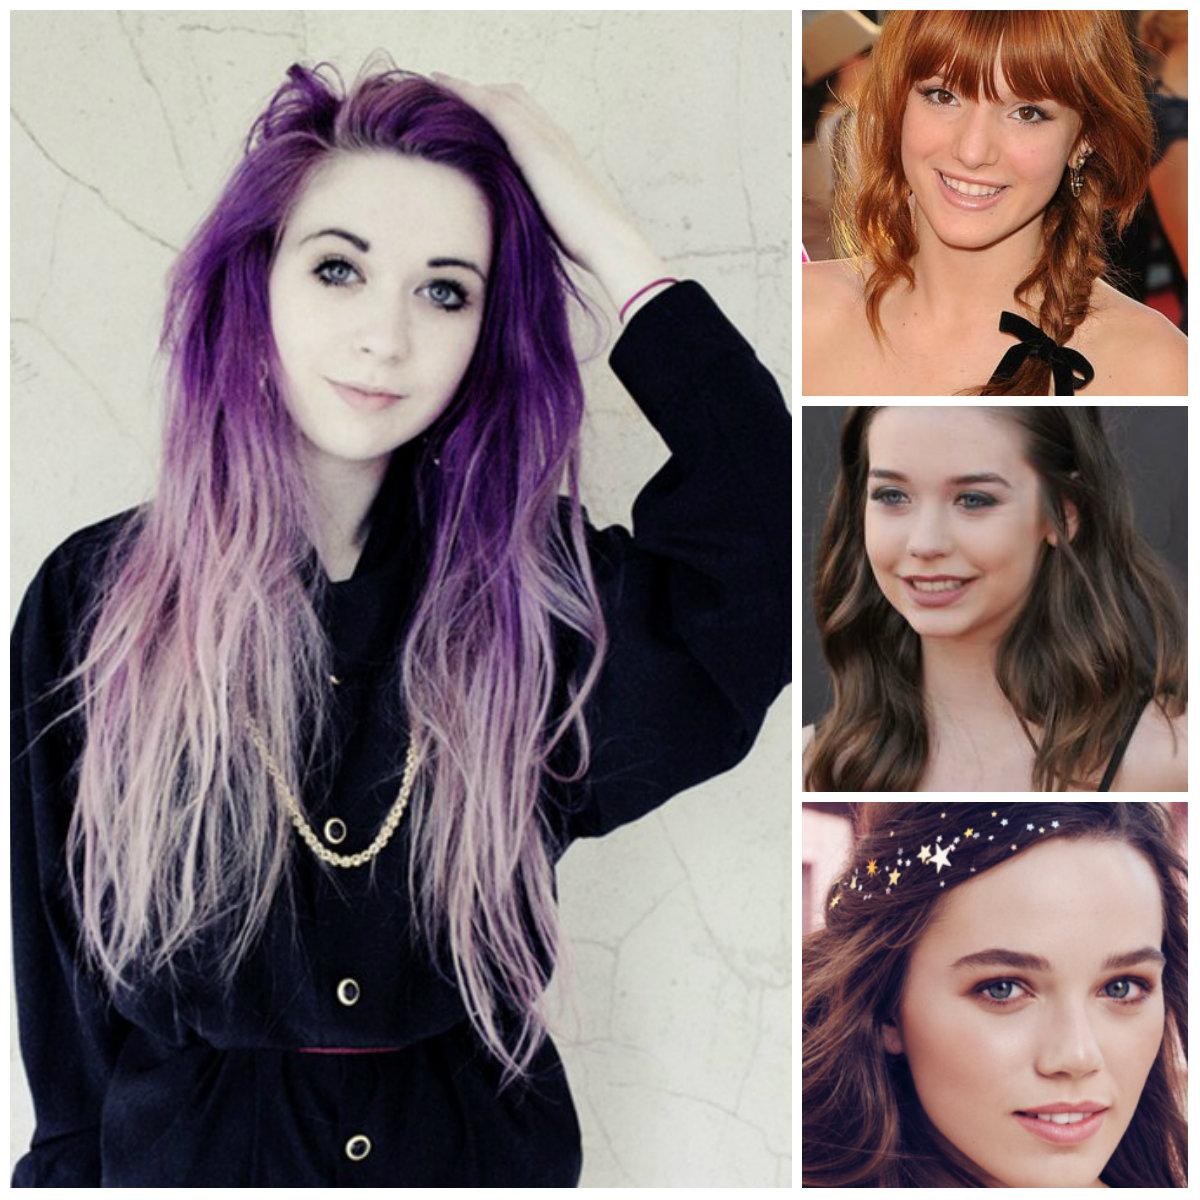 penteados adolescente para 2016